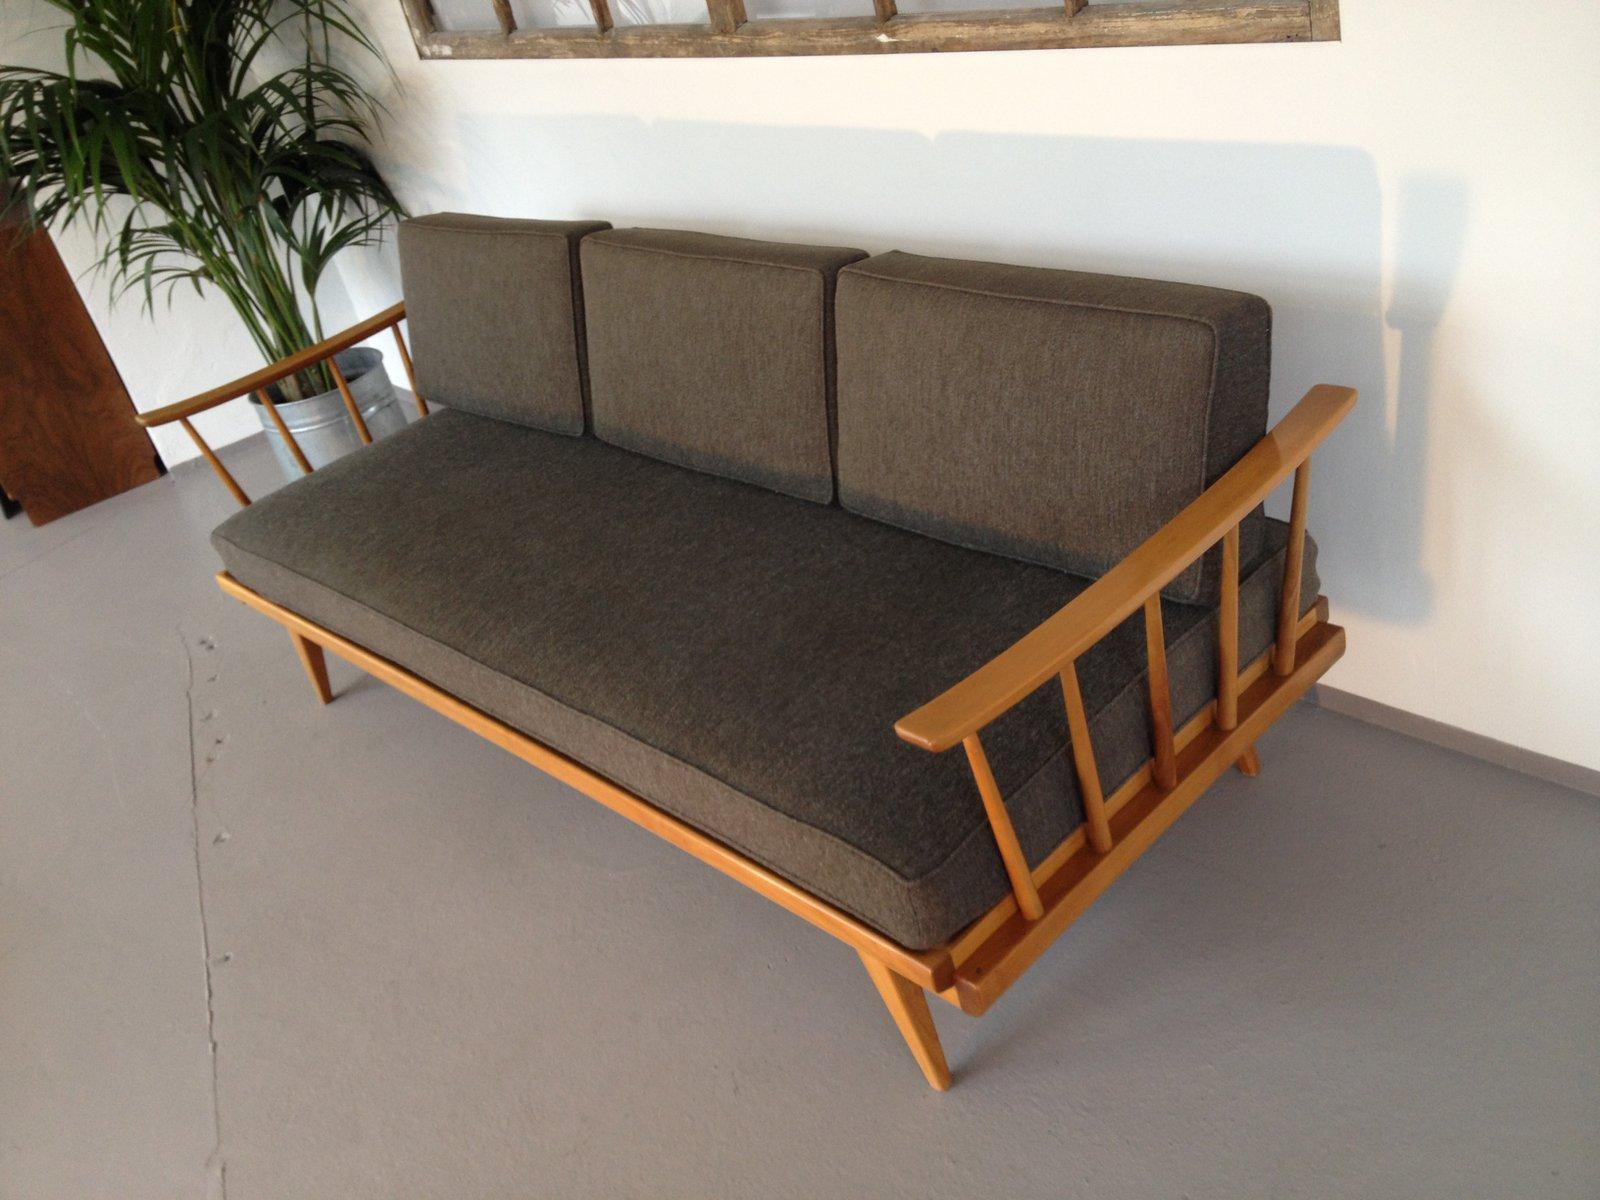 graues knoll antimott sofa von walter knoll bei pamono kaufen. Black Bedroom Furniture Sets. Home Design Ideas